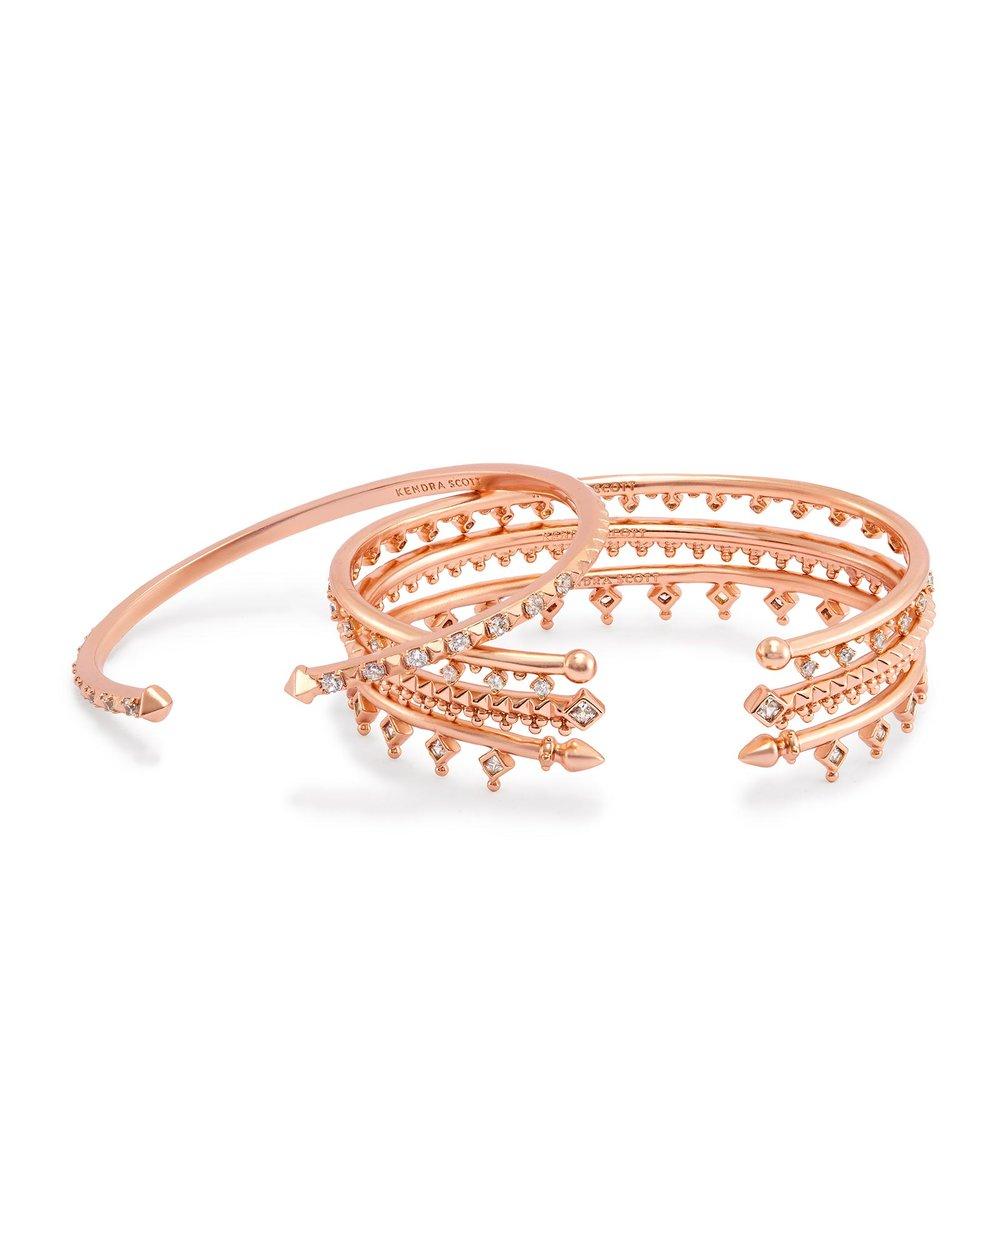 kendra-scott-delphine-rose-gold-pinch-bracelet-set_00_default_lg.jpg